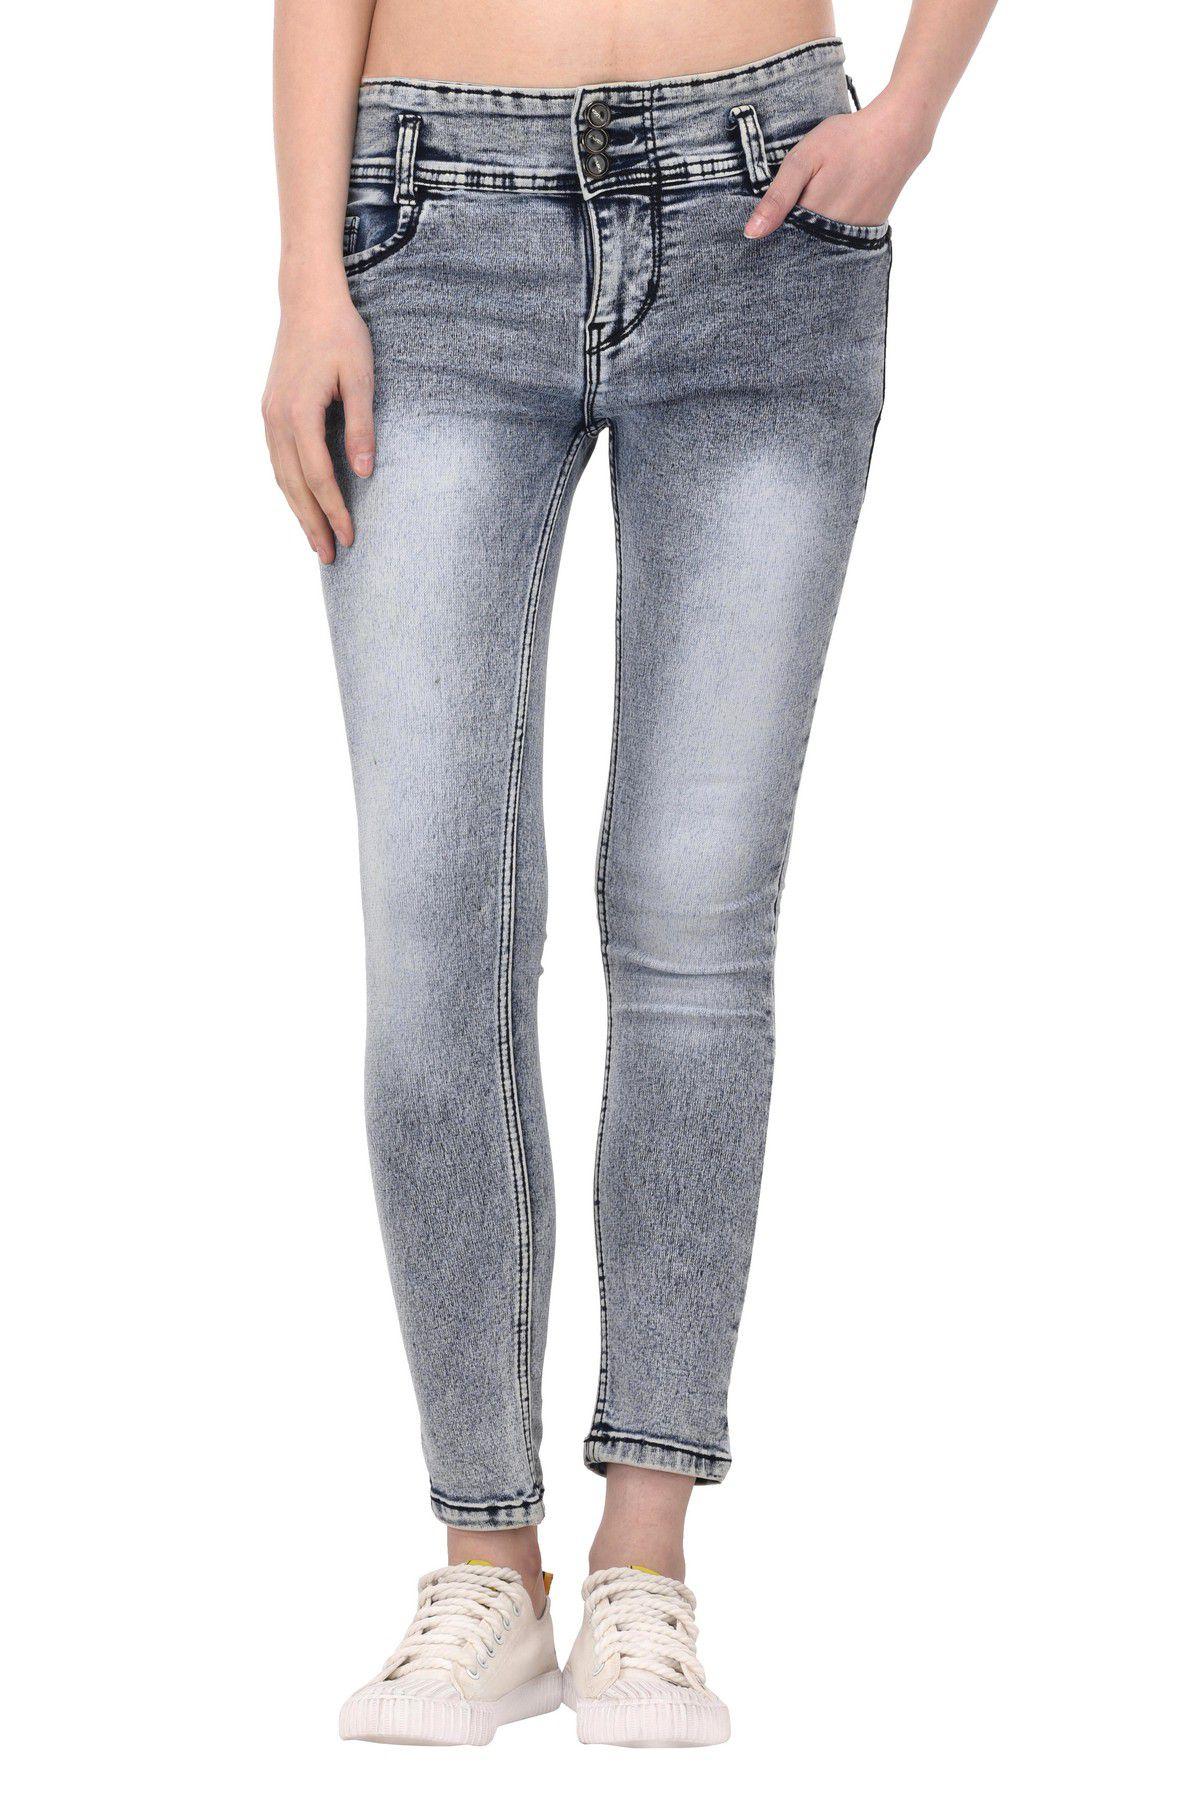 VOXATI Denim Lycra Jeans - Grey